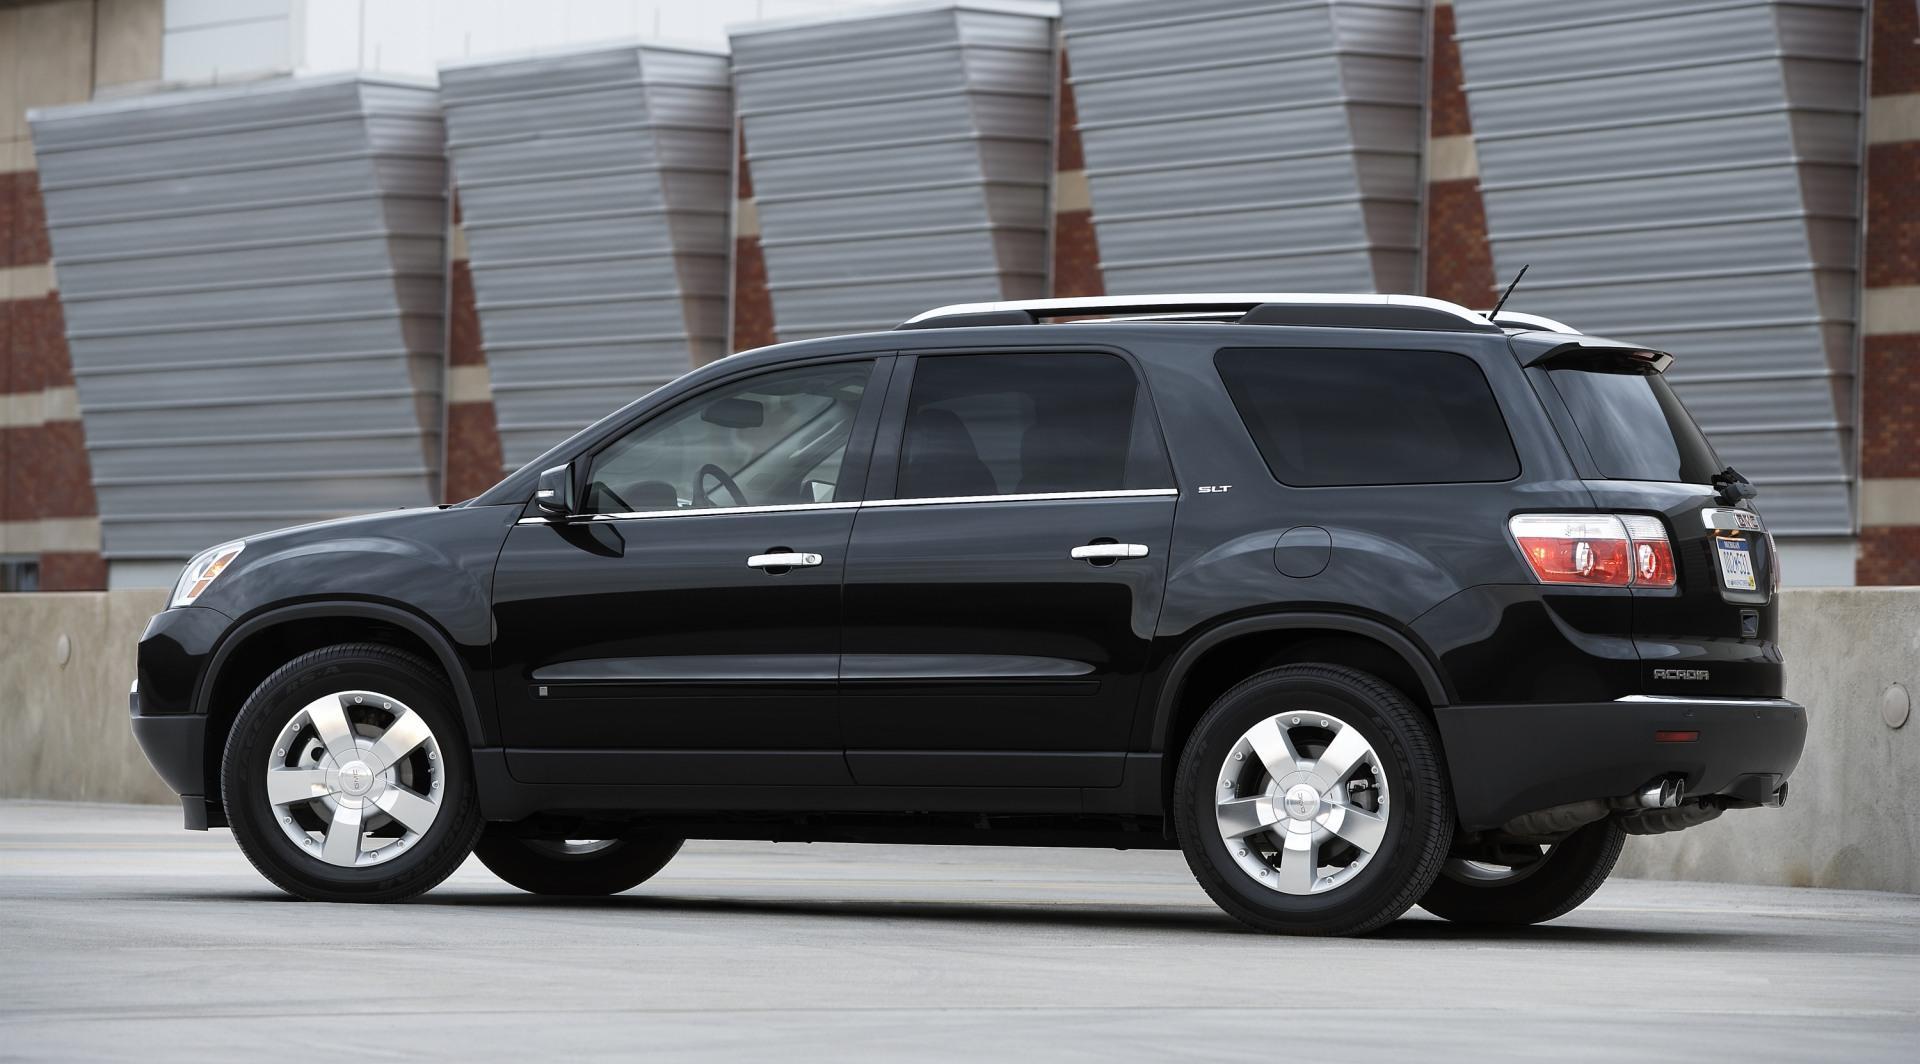 2011 GMC Acadia - conceptcarz.com